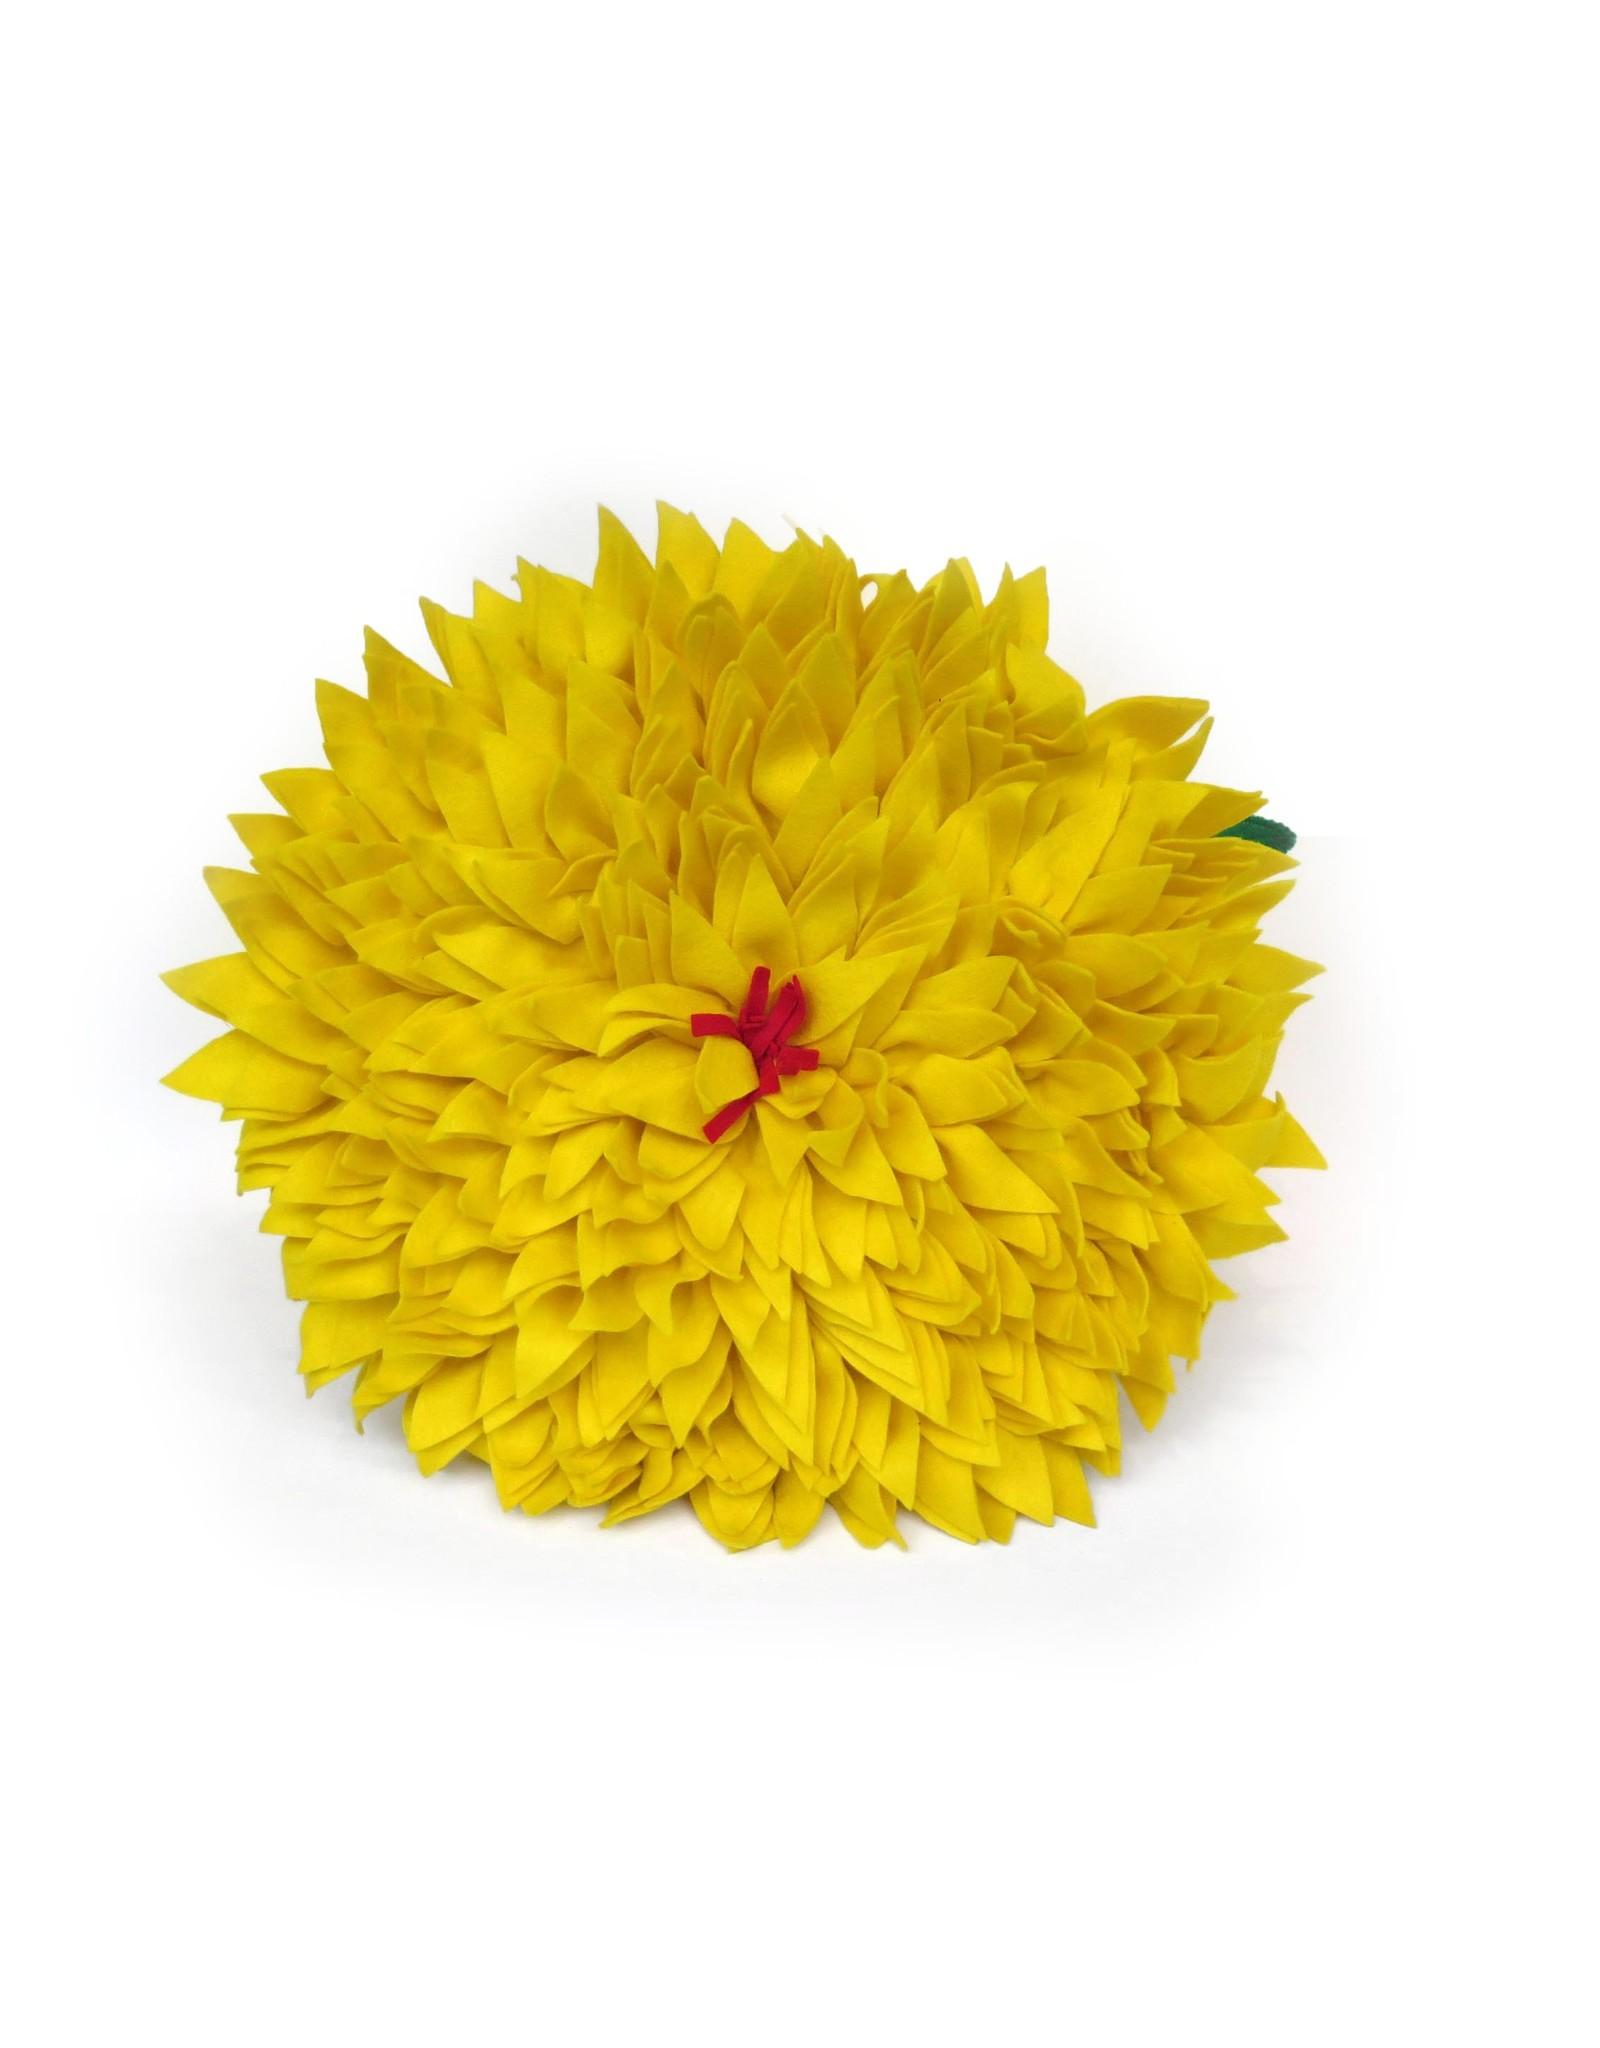 Extra Large Felt Flower Pillow (yellow), Eva Airam Studio